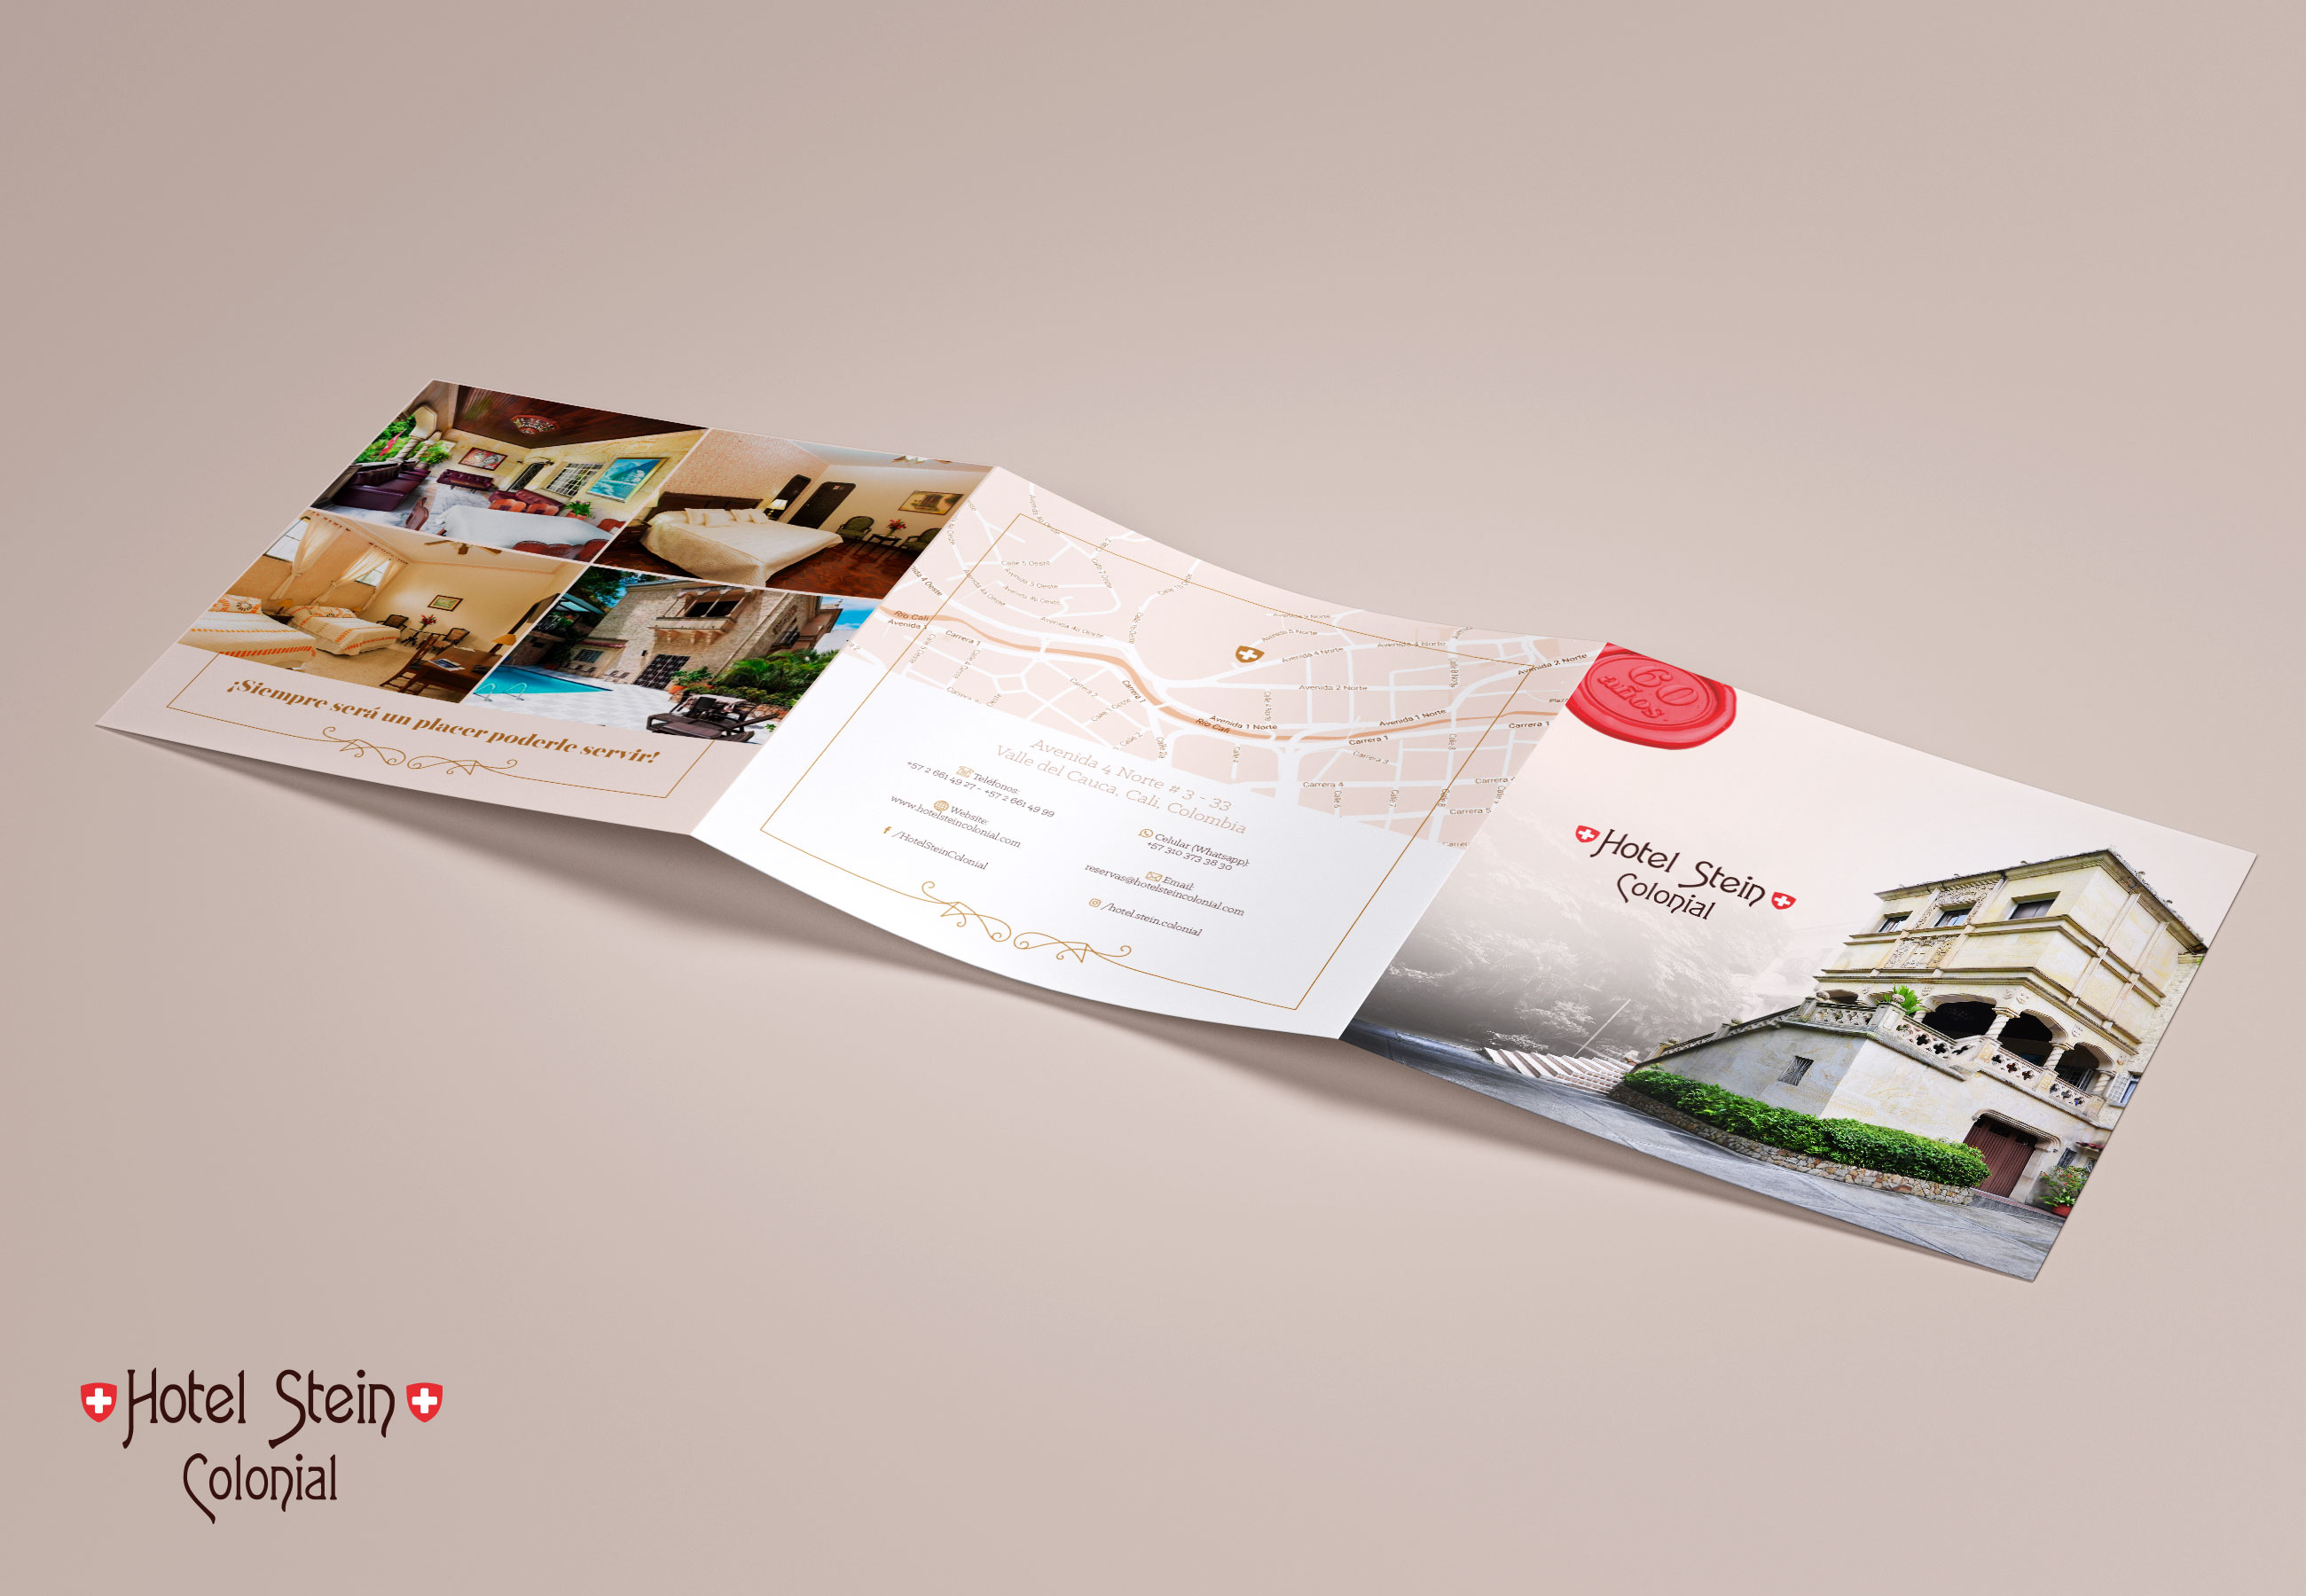 17_04_06_Muestra_Brochure_Hotel_Stein_Colonial_1